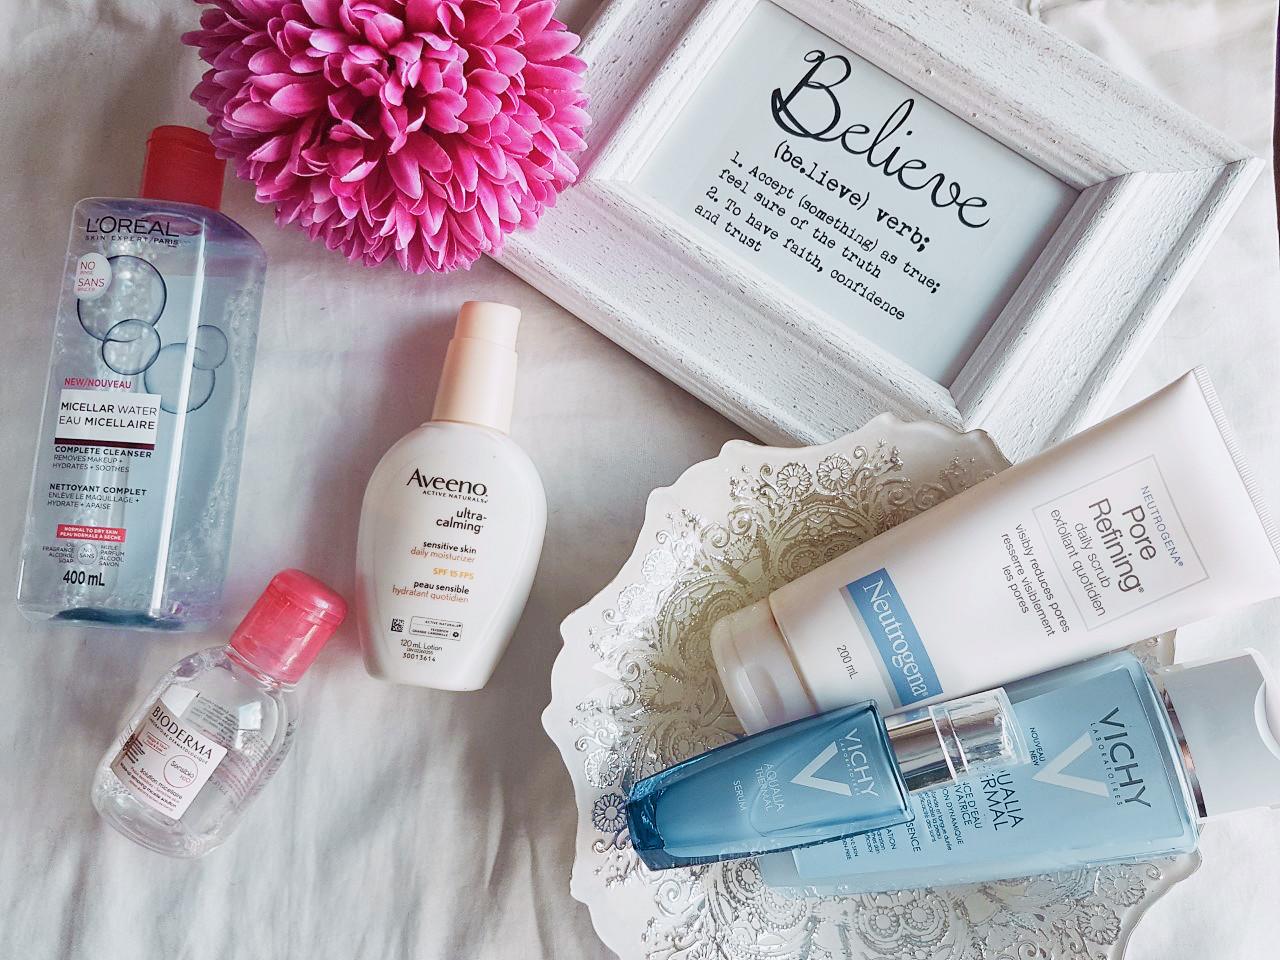 skincare, beauty, neutrogena, Vichy, bioderma, health, skin health, aveeno